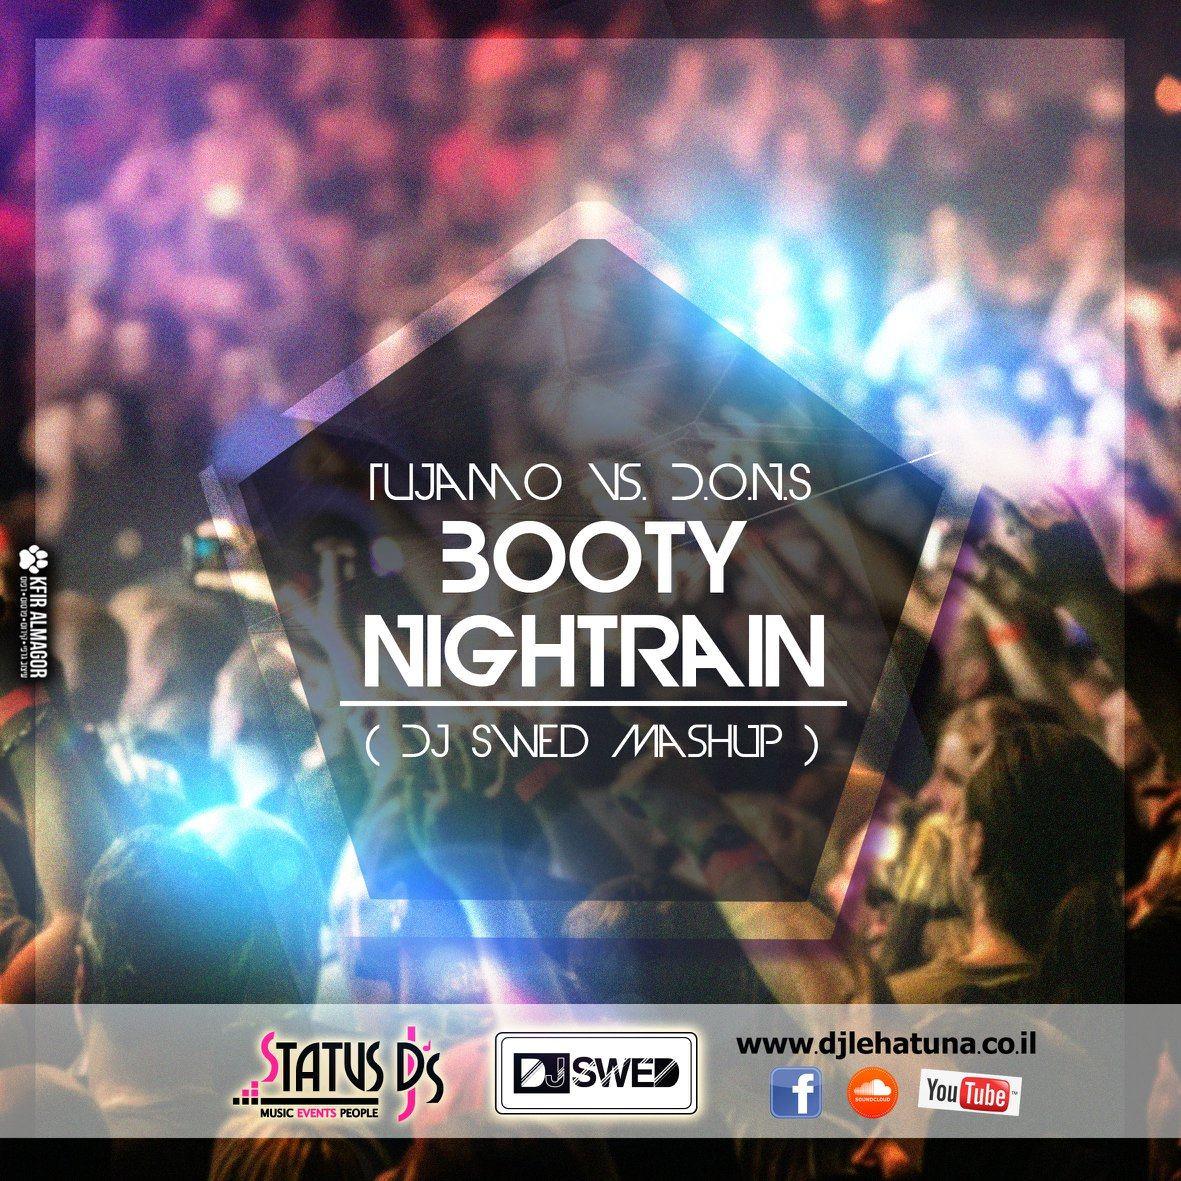 Tujamo vs DONS - Booty Nightrain DJ Swed MashUp